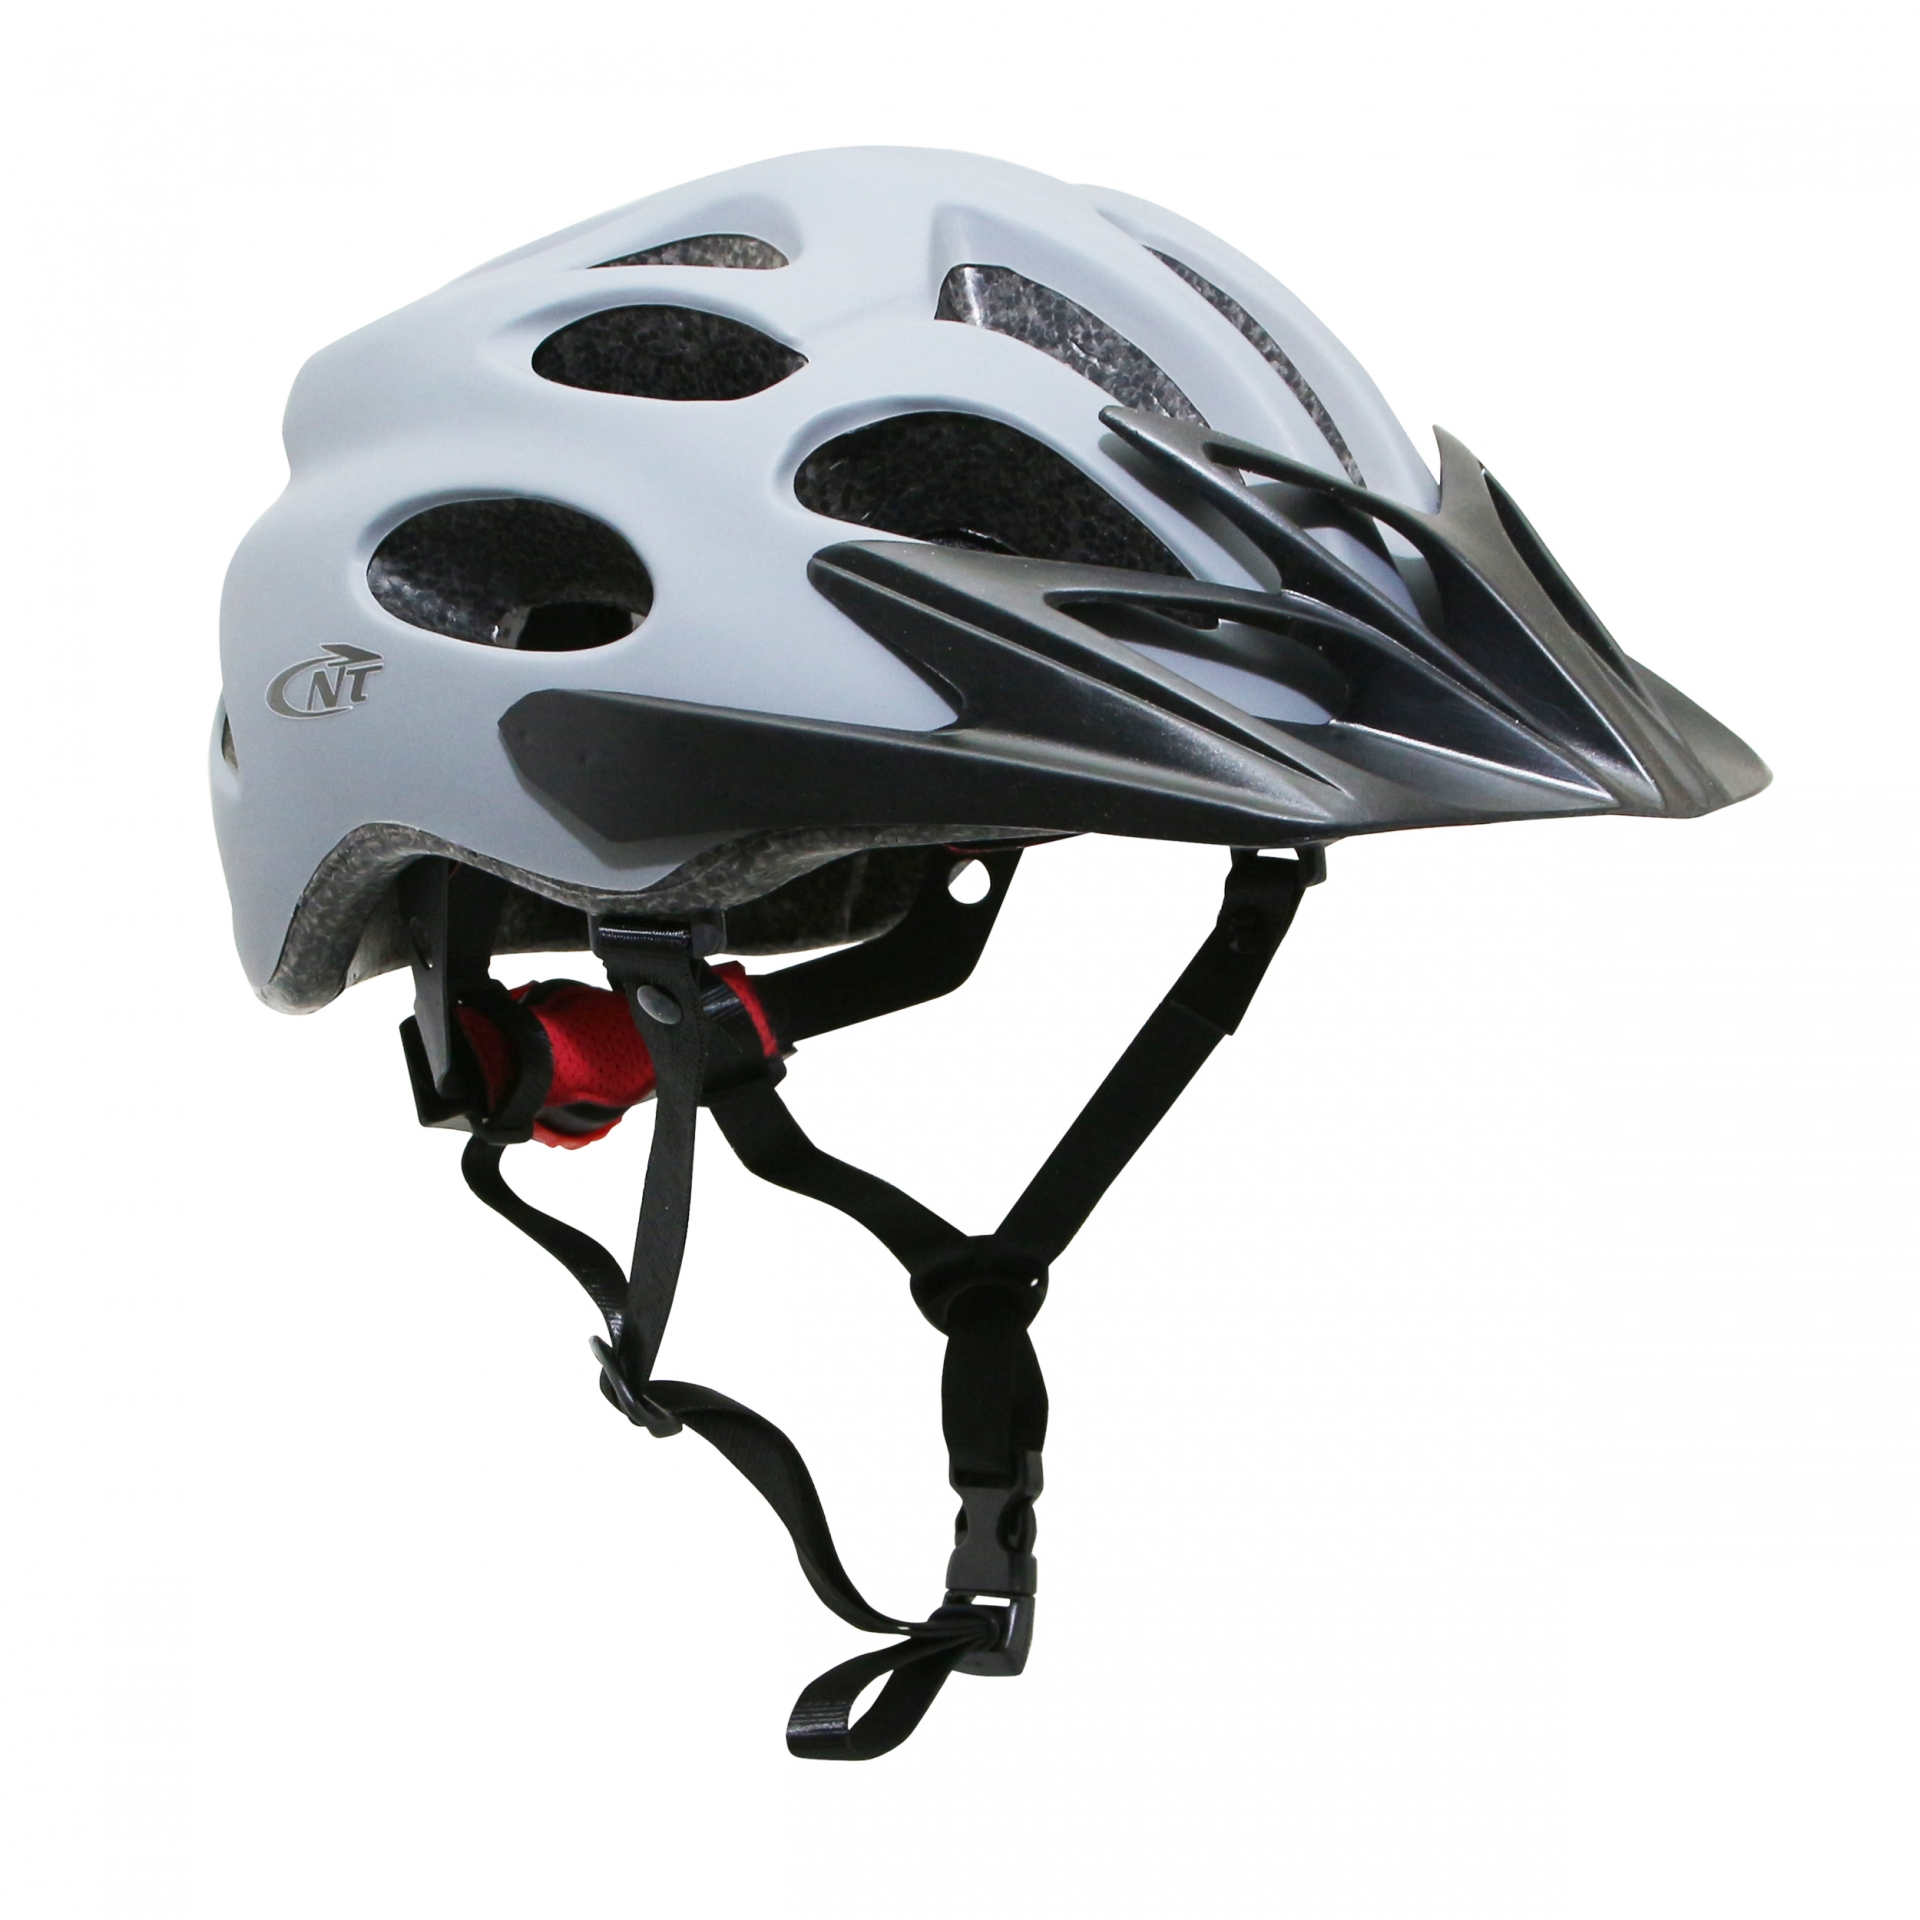 Casque vélo adulte Newton City V1 Gris clair - 55-58 cm